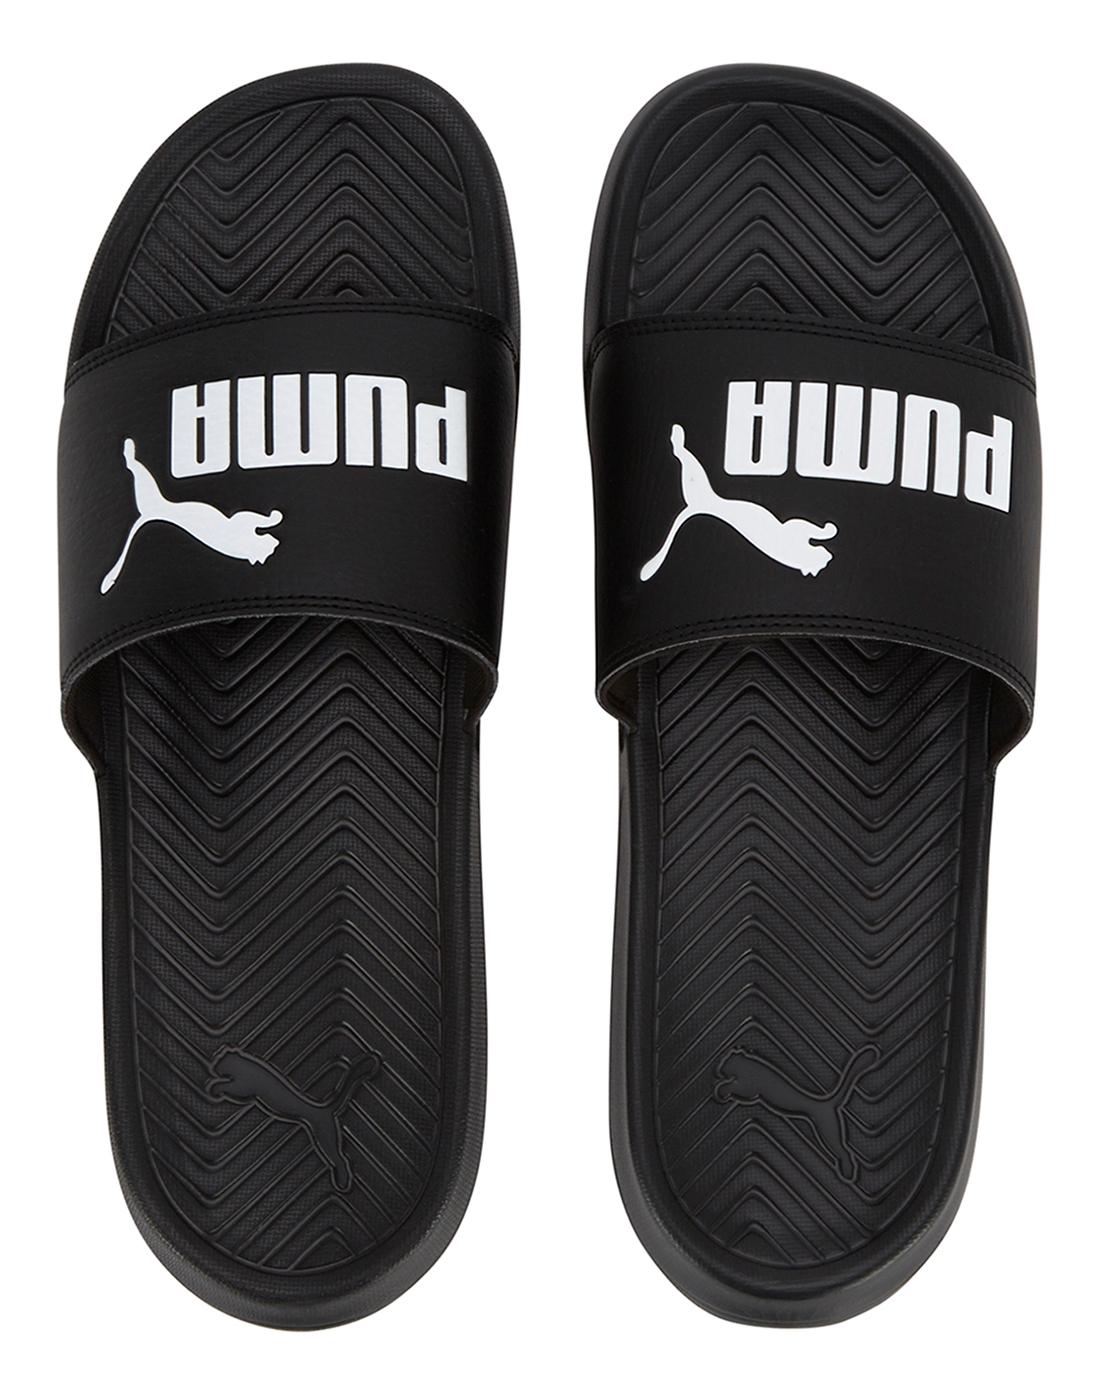 9296c8f38a4c5 Puma Mens Puma Pop Cat Slides